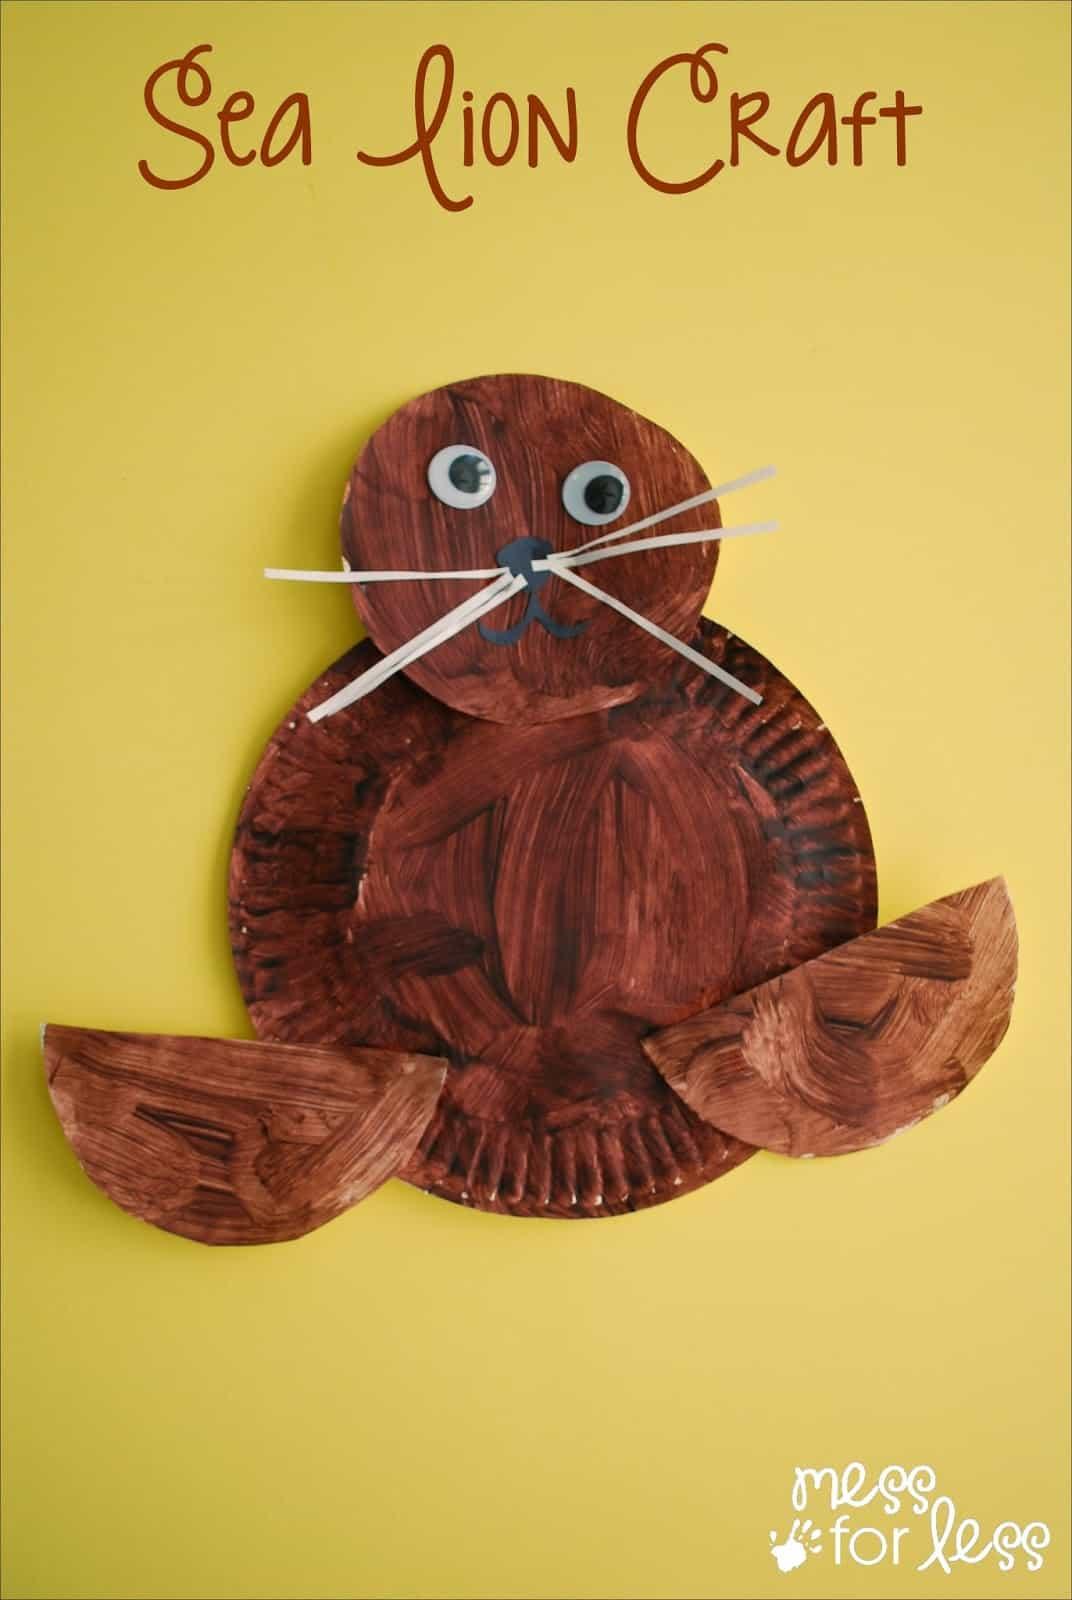 Uniquely Californian Sea Lion Craft